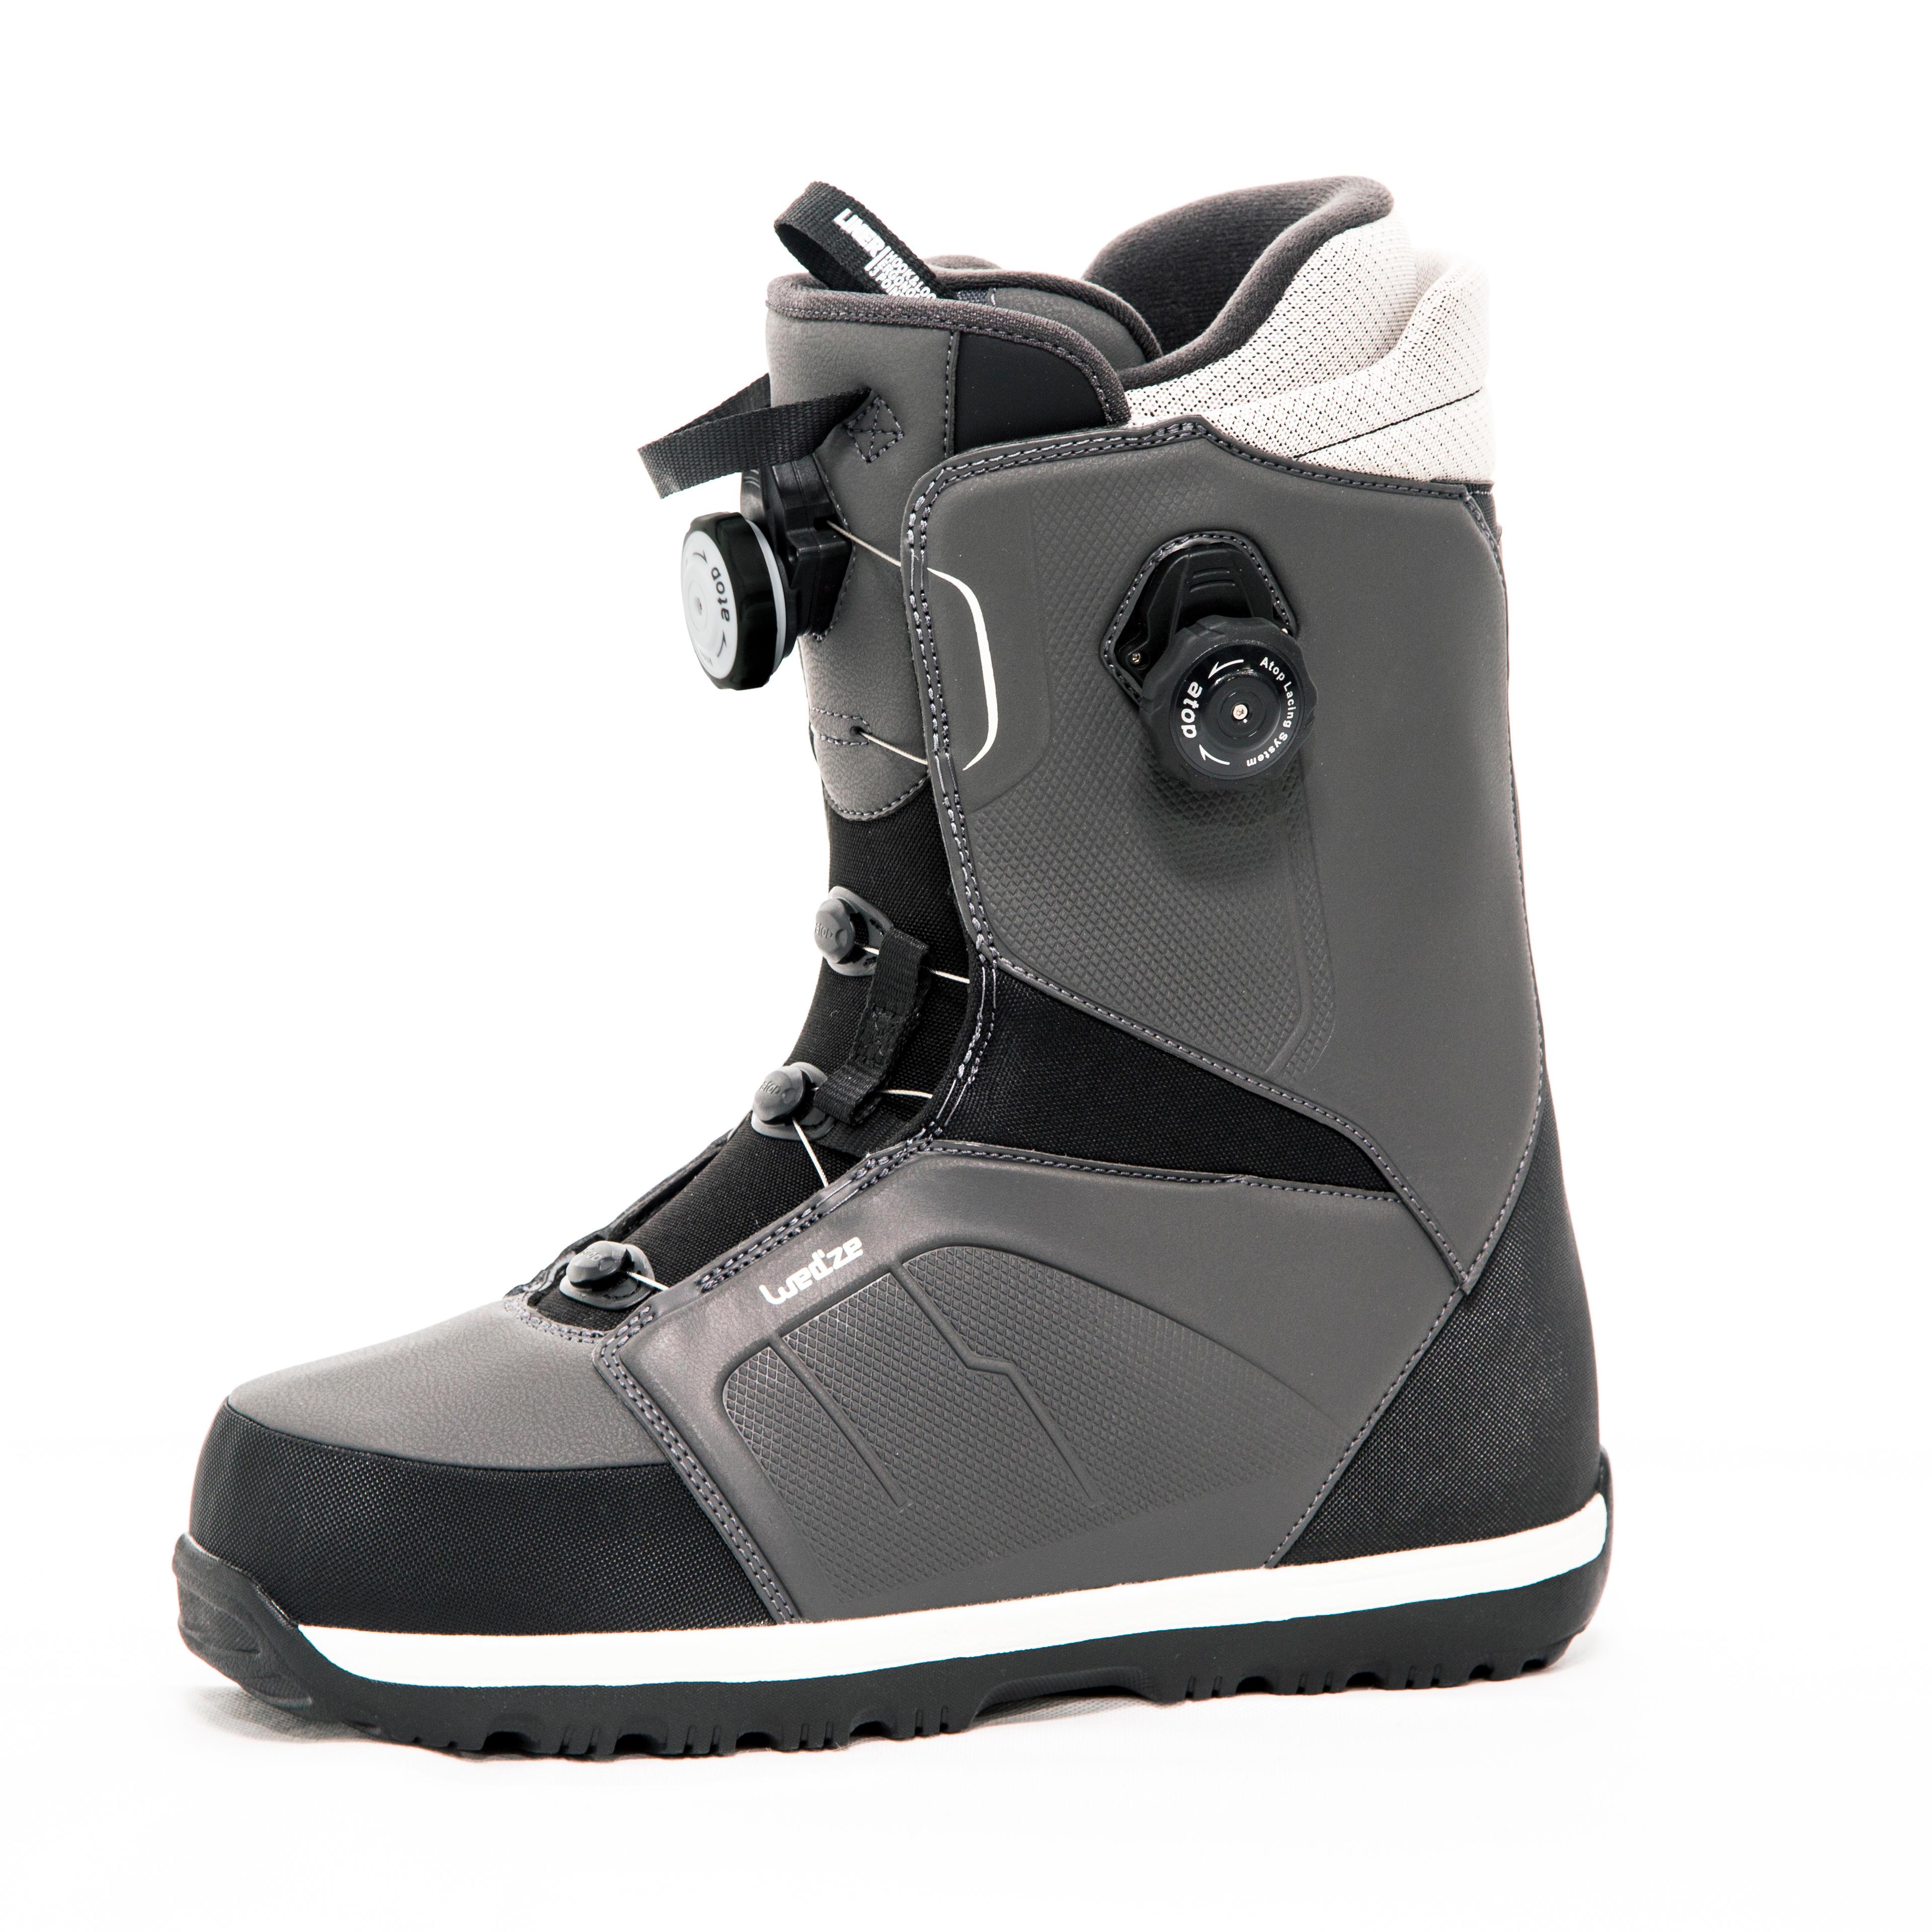 Boots snowboard All Road 900 imagine